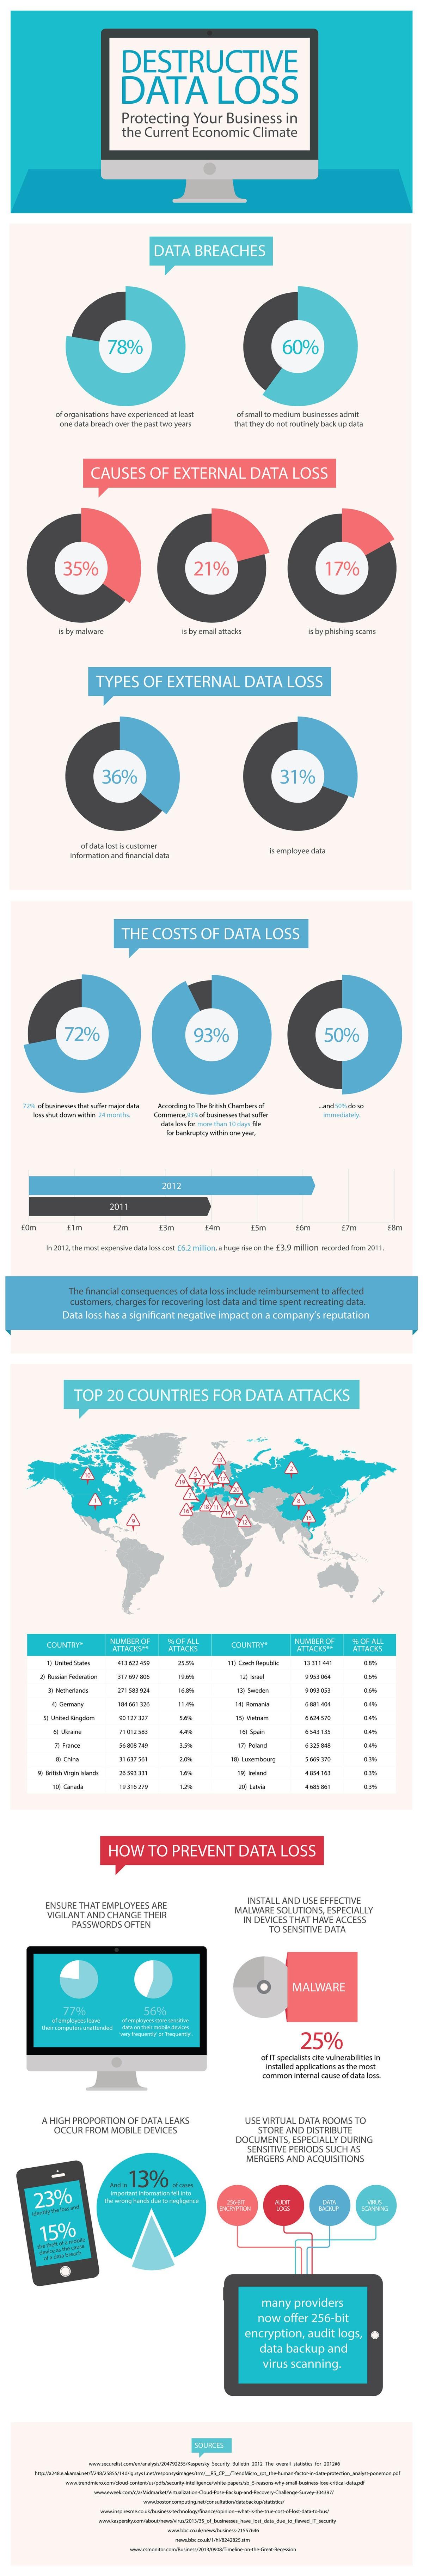 destructive-data-loss-imprima-blog-hostalia-hosting